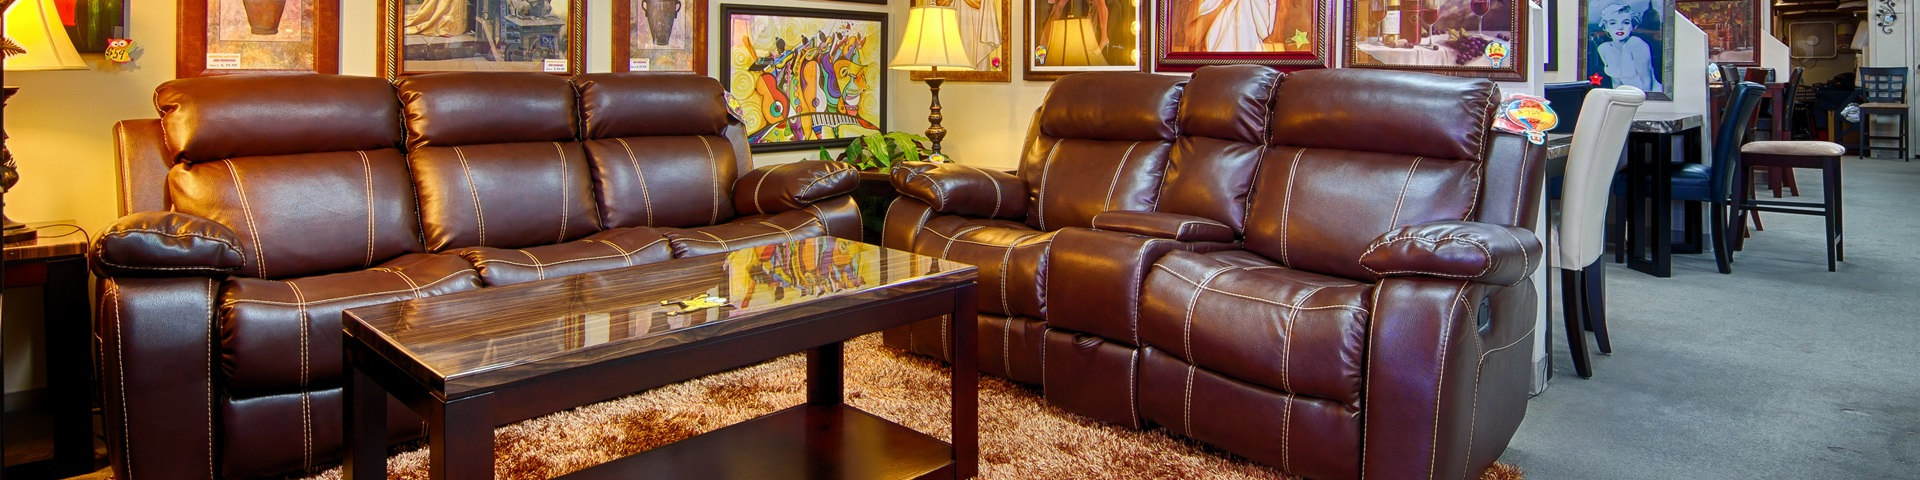 Discount Furniture Store In Dallas Fort Worth Metroplex